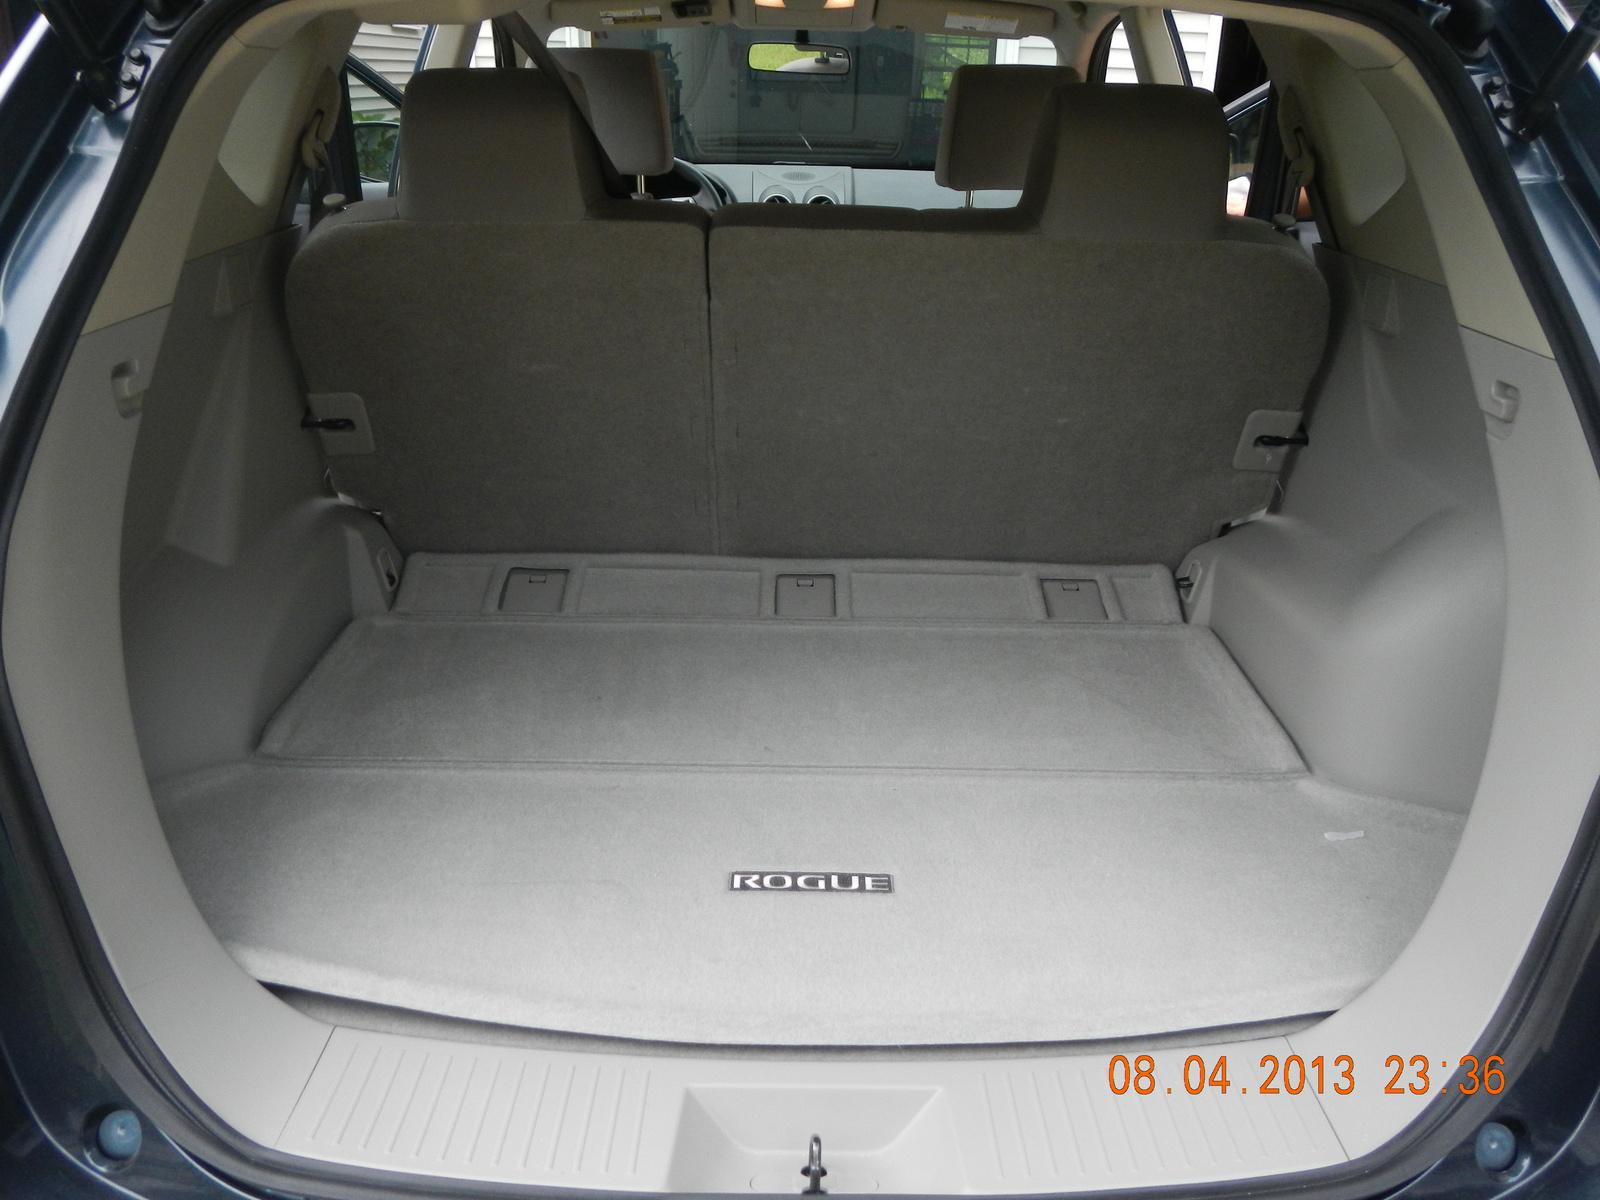 2013 Nissan Rogue Interior Pictures Cargurus